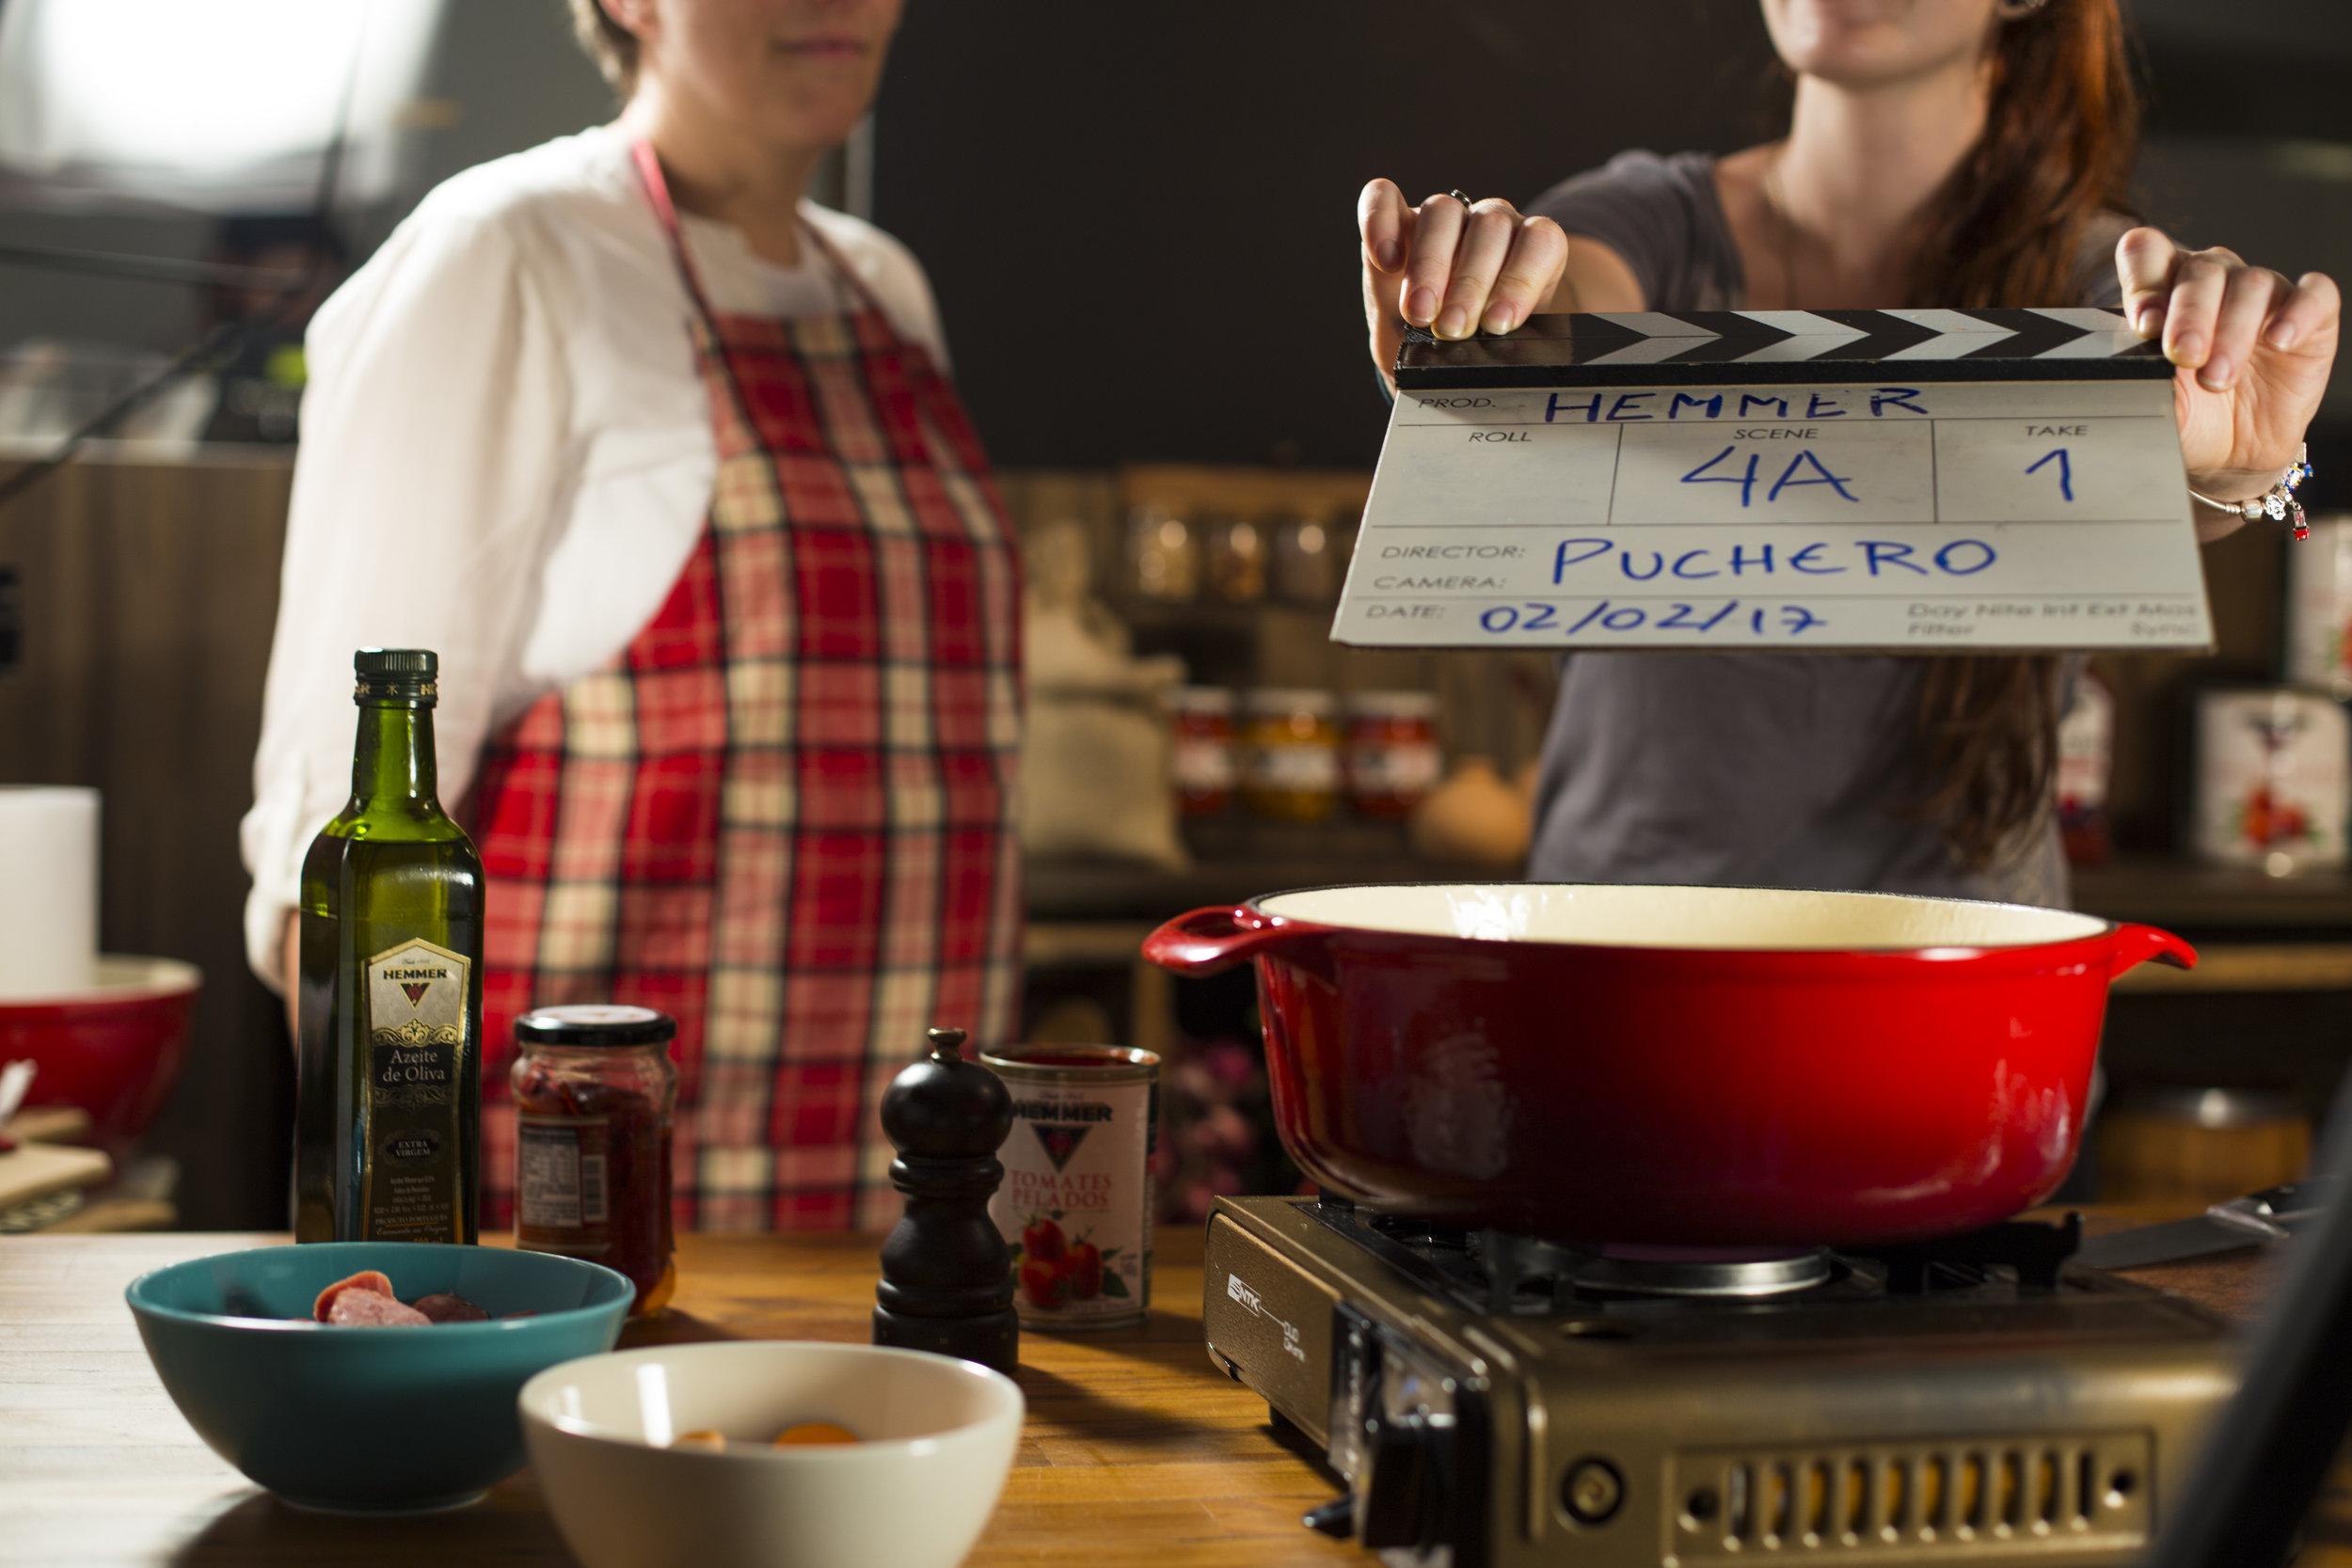 video_receita_produtora_curitiba_hemmer_alimentos_audiovisual_gastronomia_saltedcaramel_filmes_audiovisual